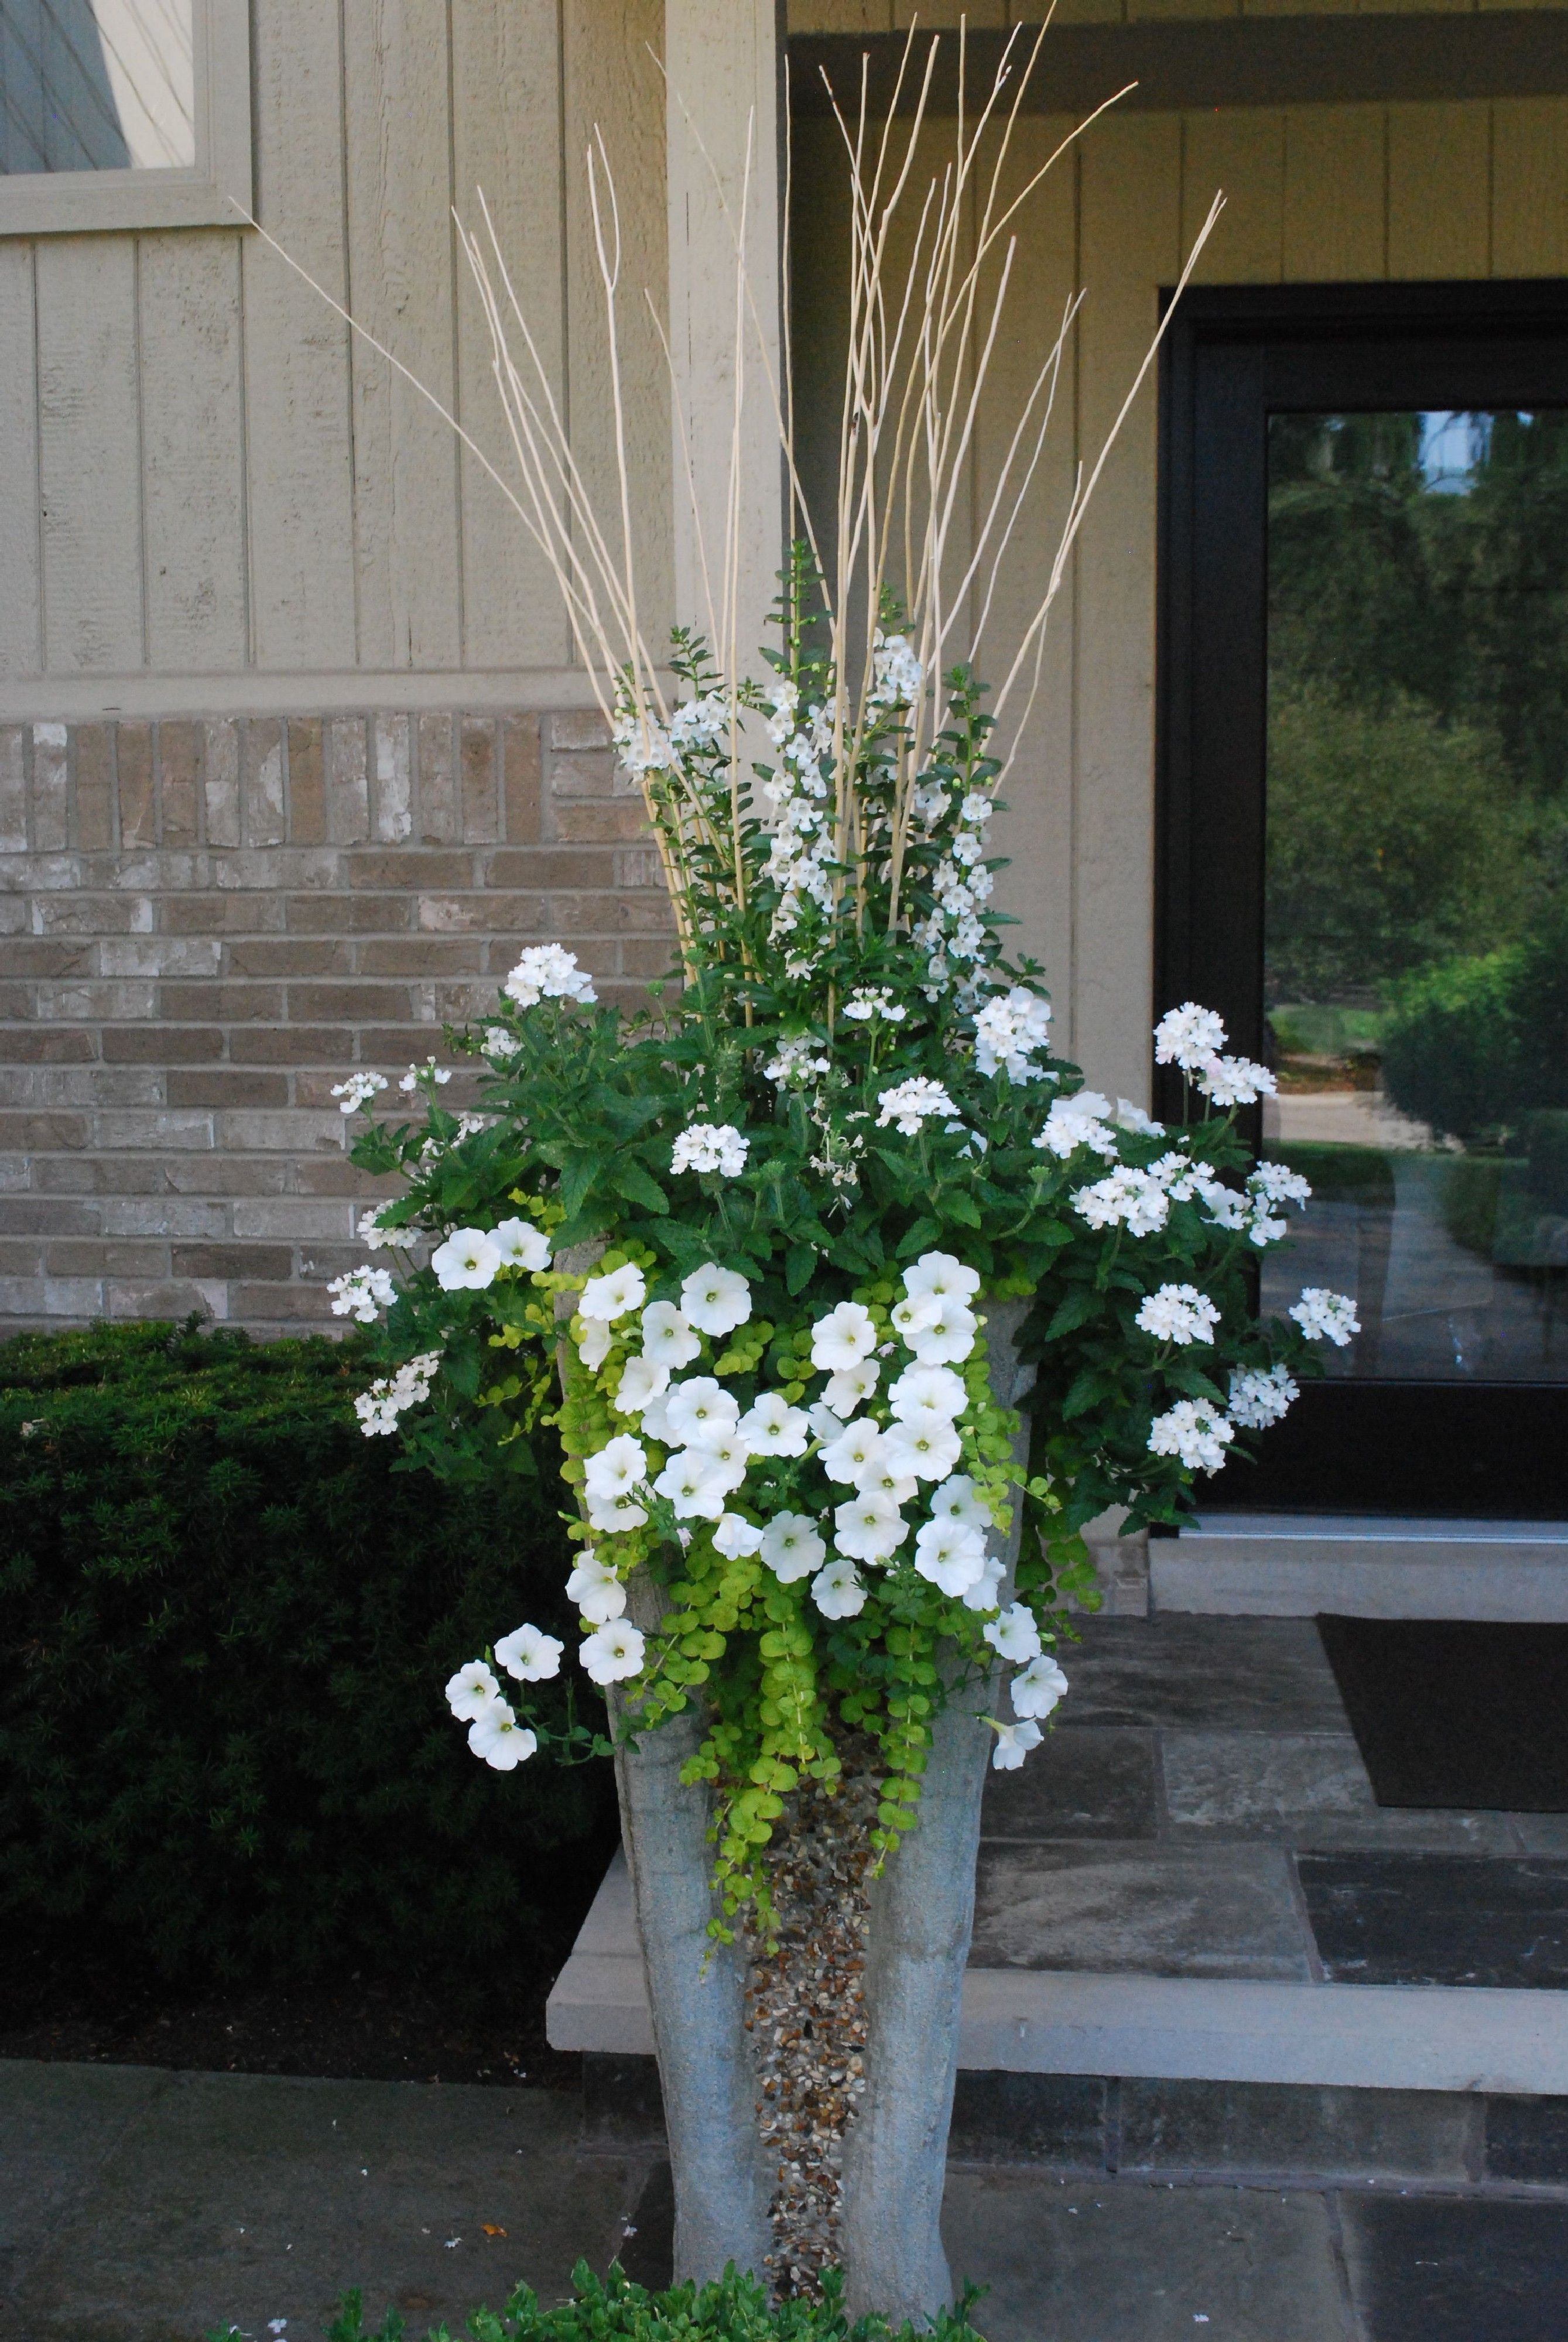 Best 15 stunning summer planter ideas to beautify your home garden best 15 stunning summer planter ideas izmirmasajfo